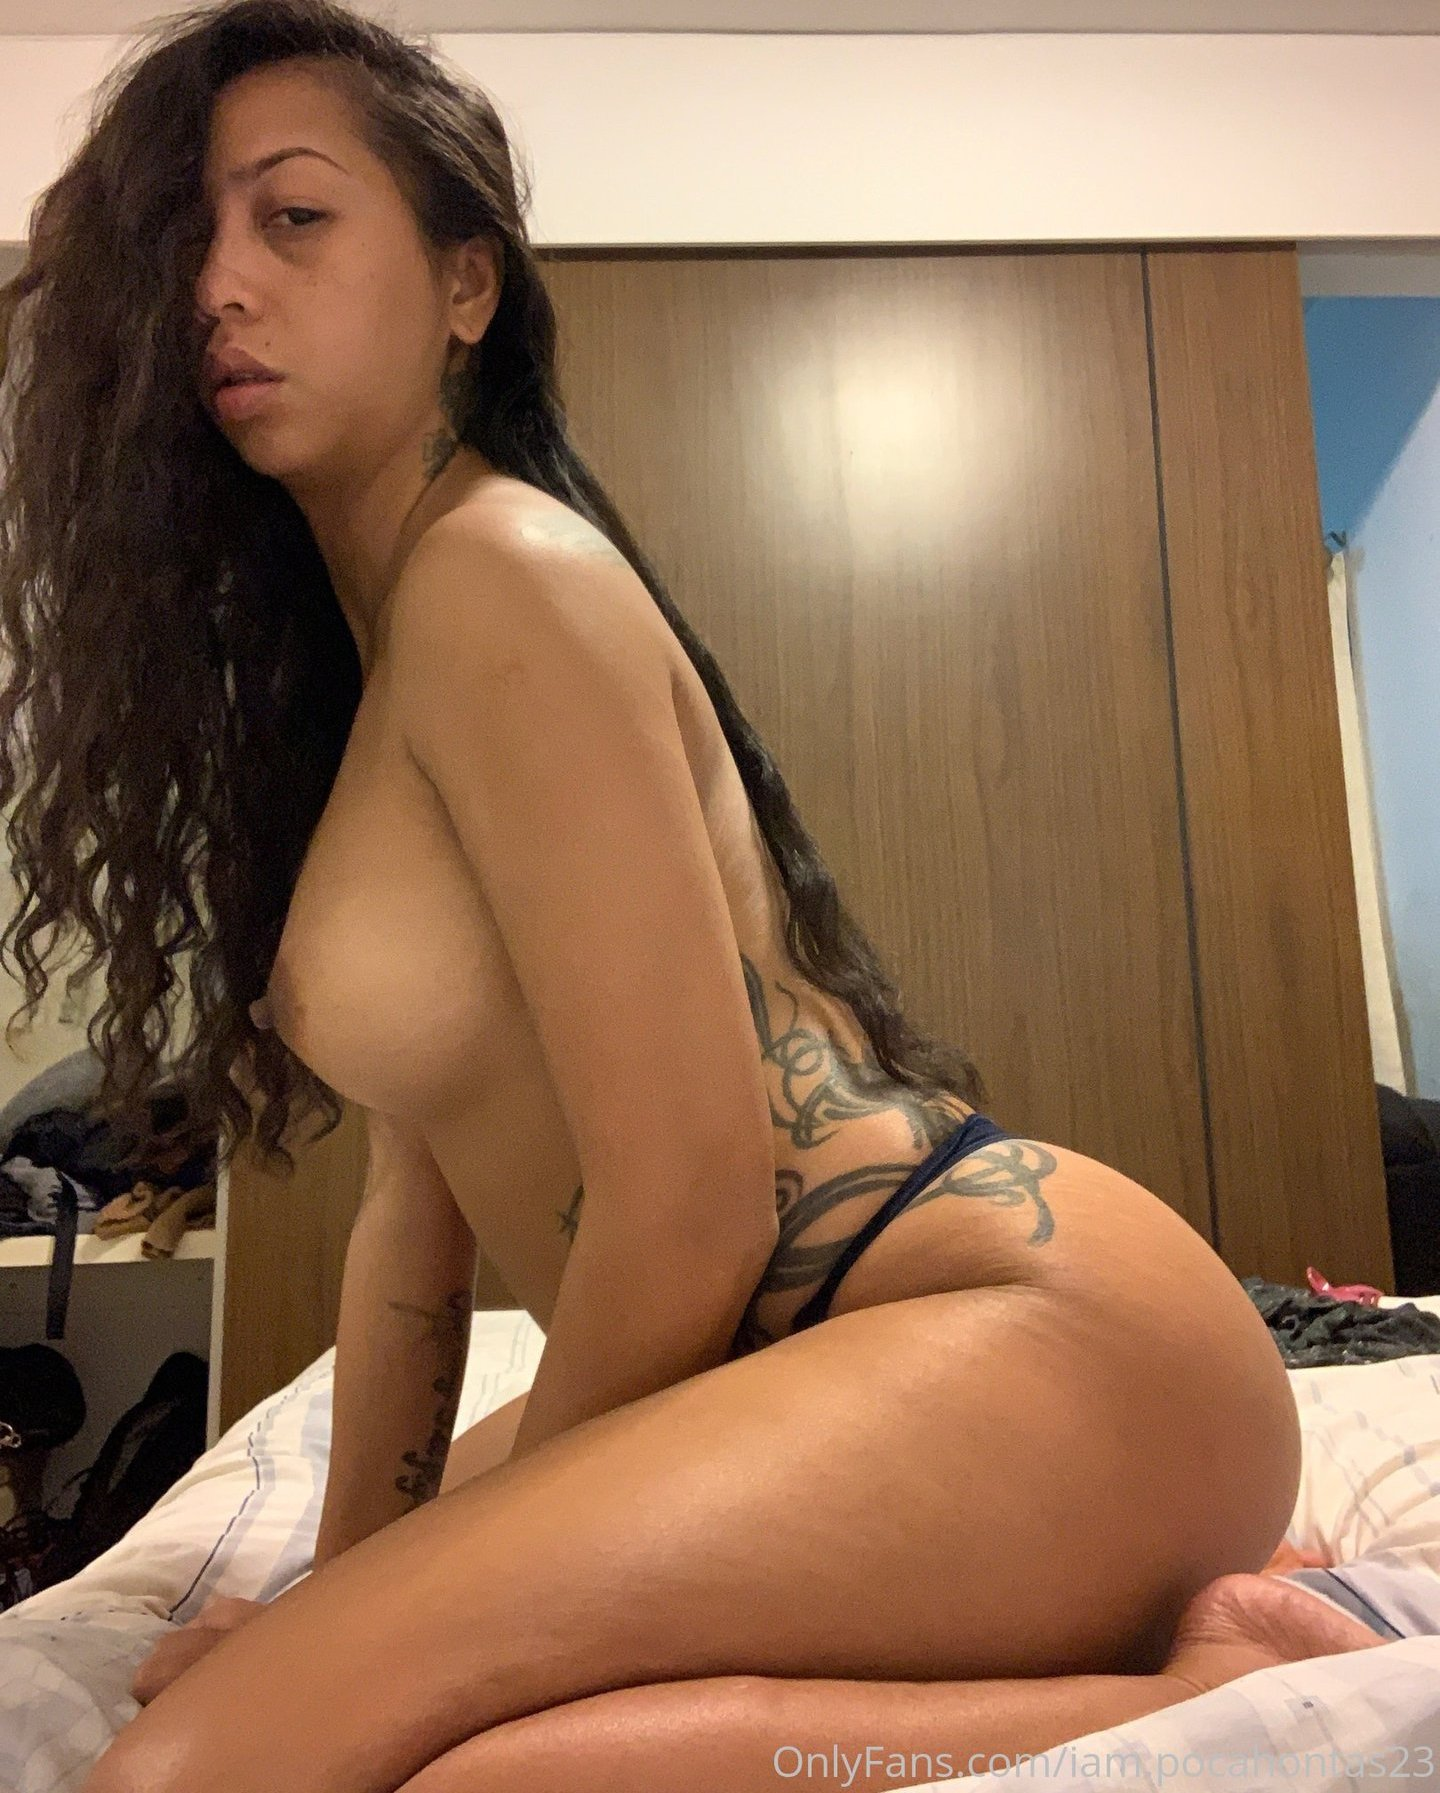 Asian Thai Girl Iampocahontas Onlyfans Nude Leaks 0025